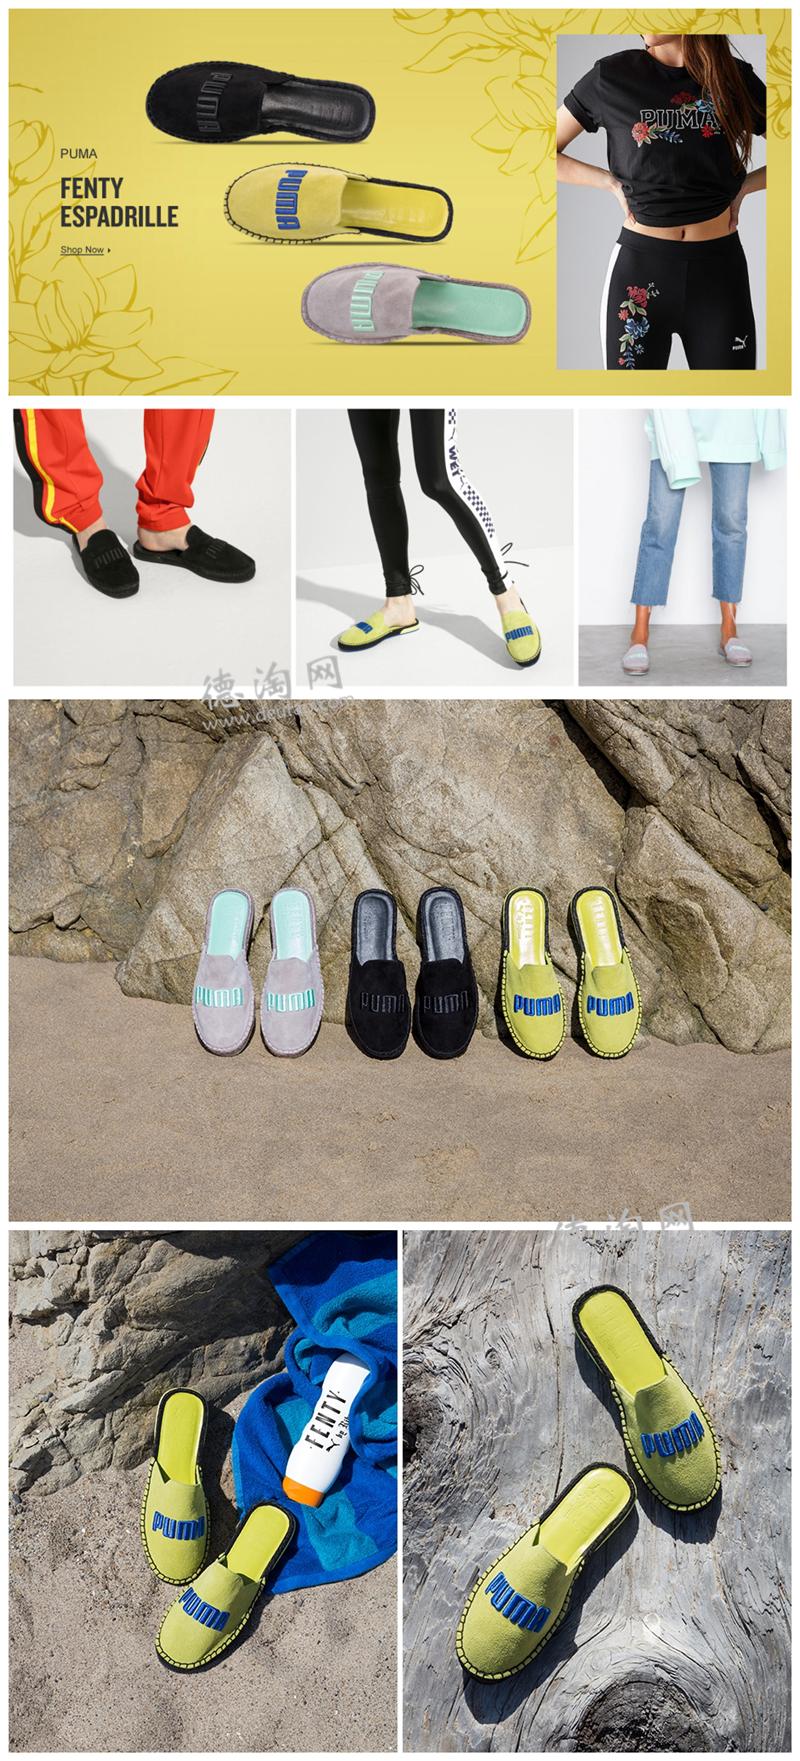 9edb82b66e0c51 你需要一双编织休闲凉鞋!Fenty x PUMA Espadrille 编织涼鞋仅剩黄色款有 ...